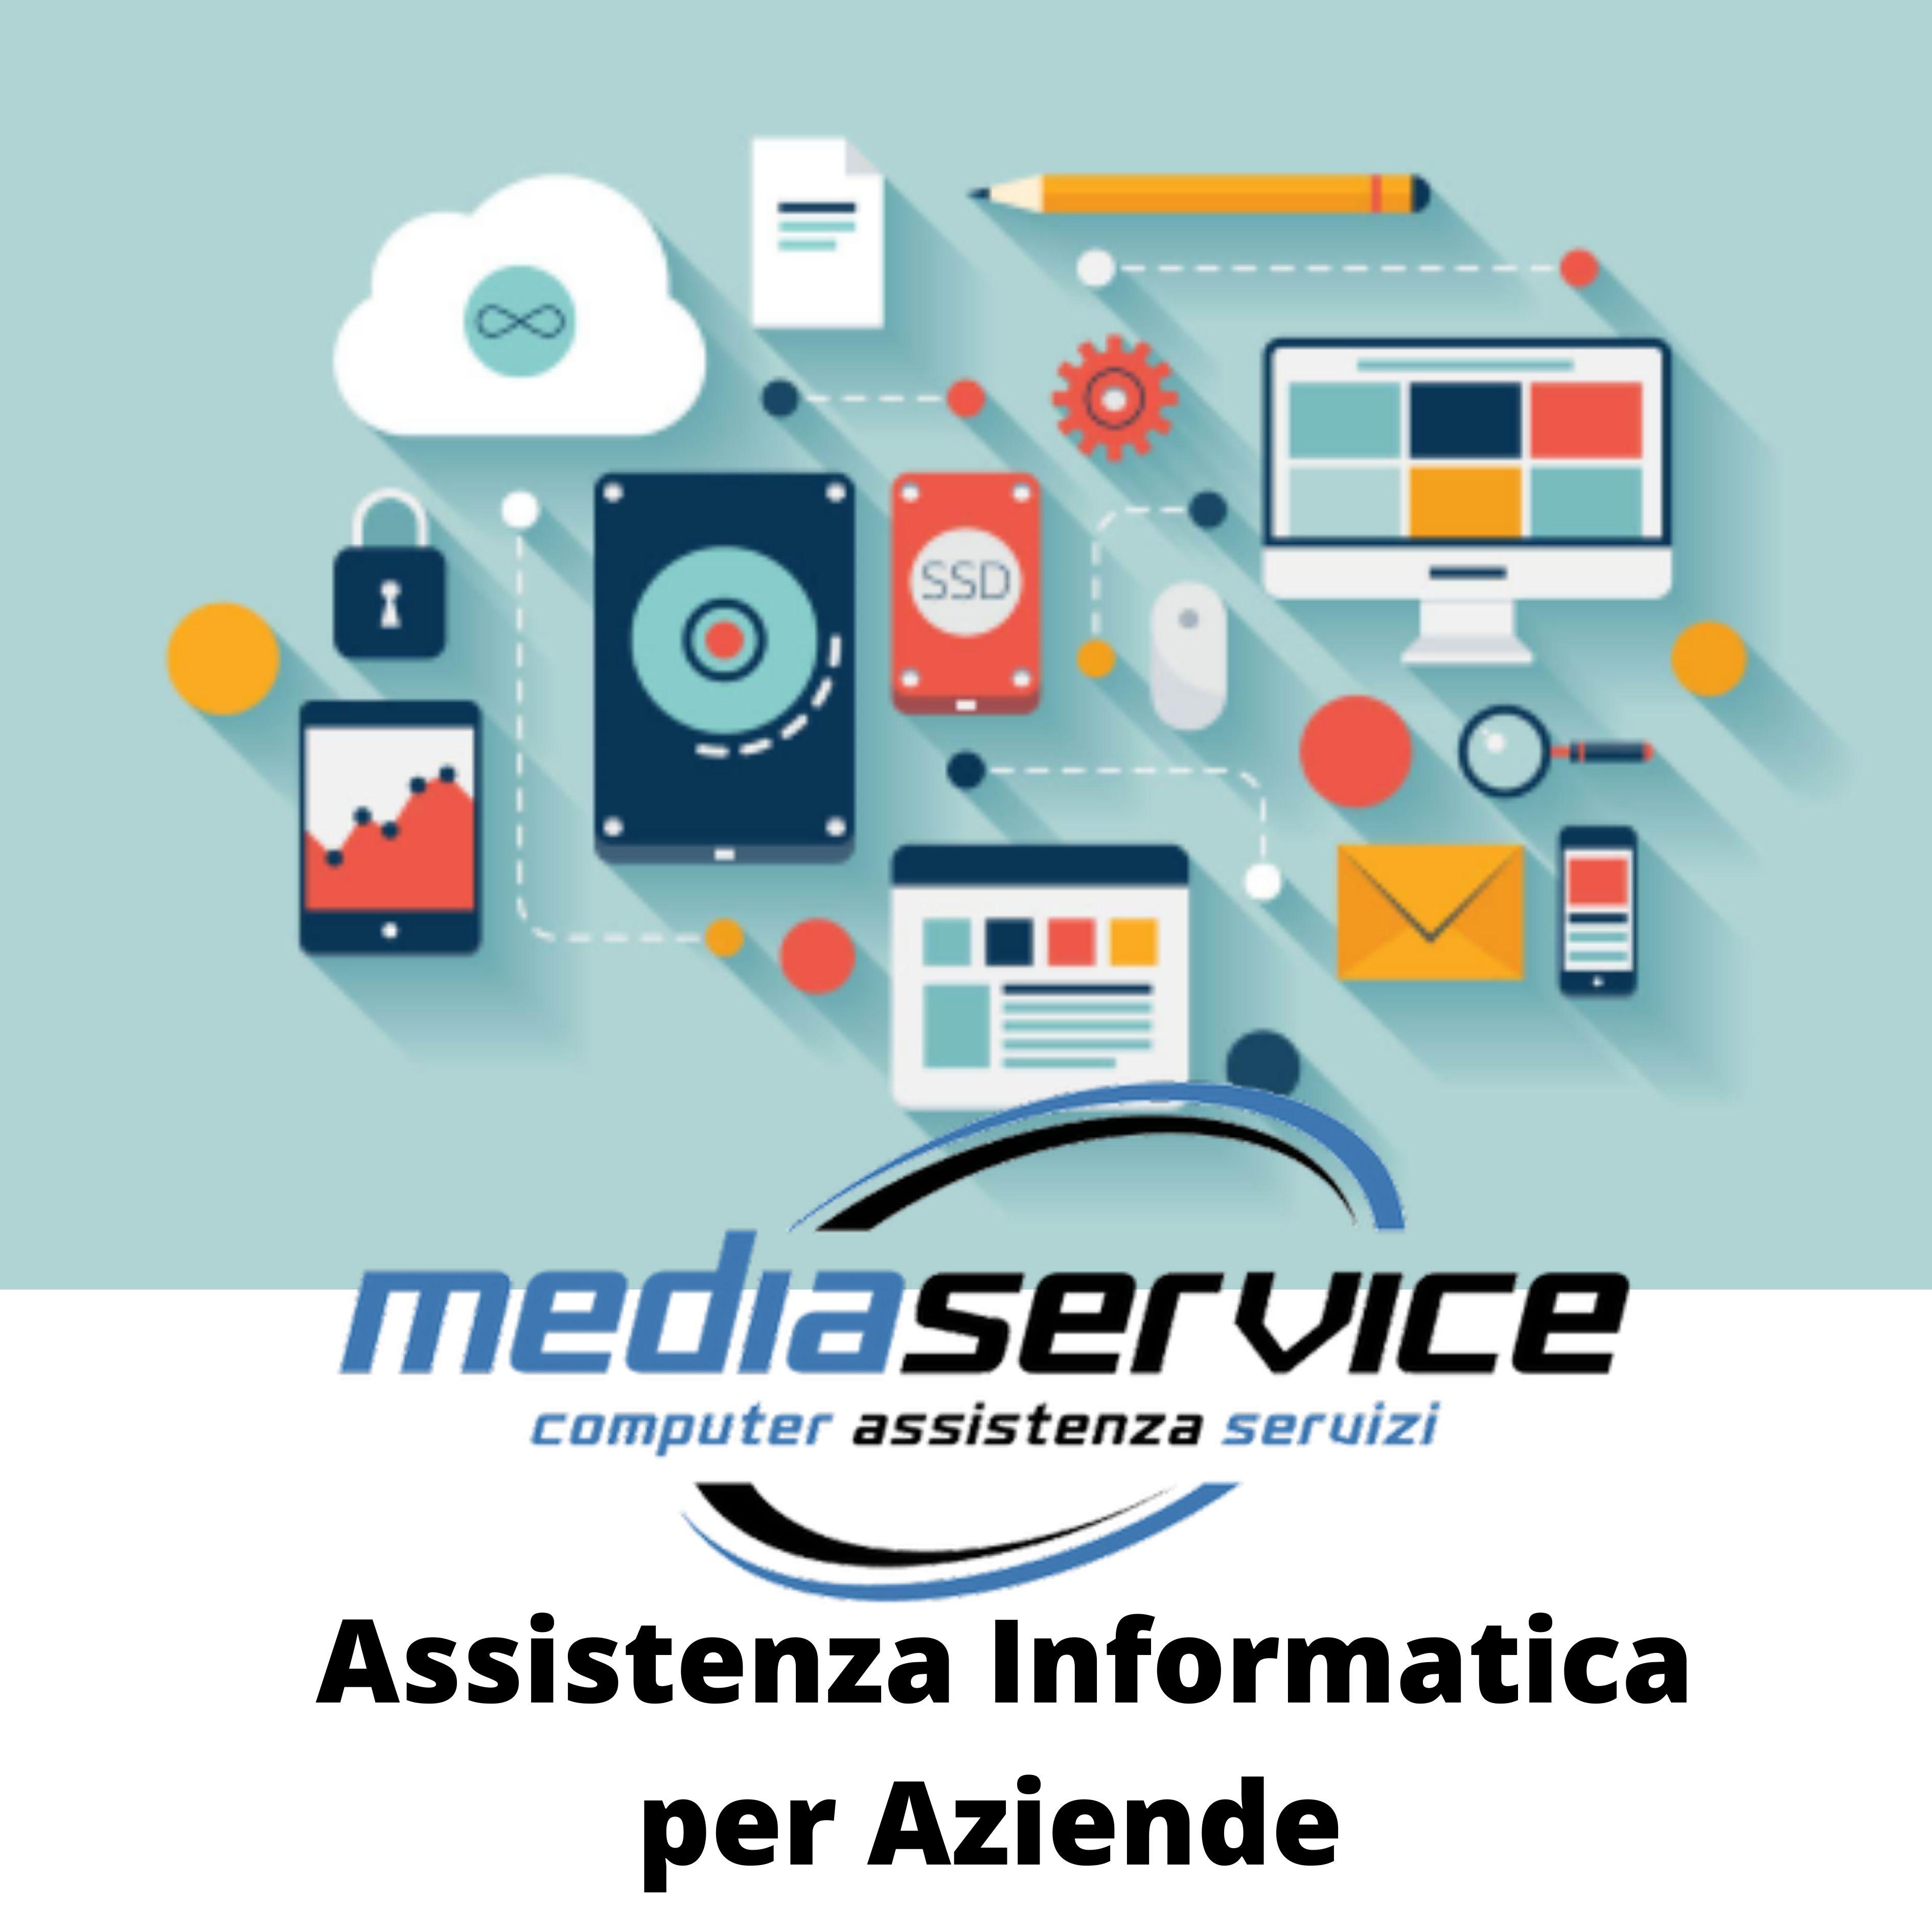 Assistenza Informatica per Aziende